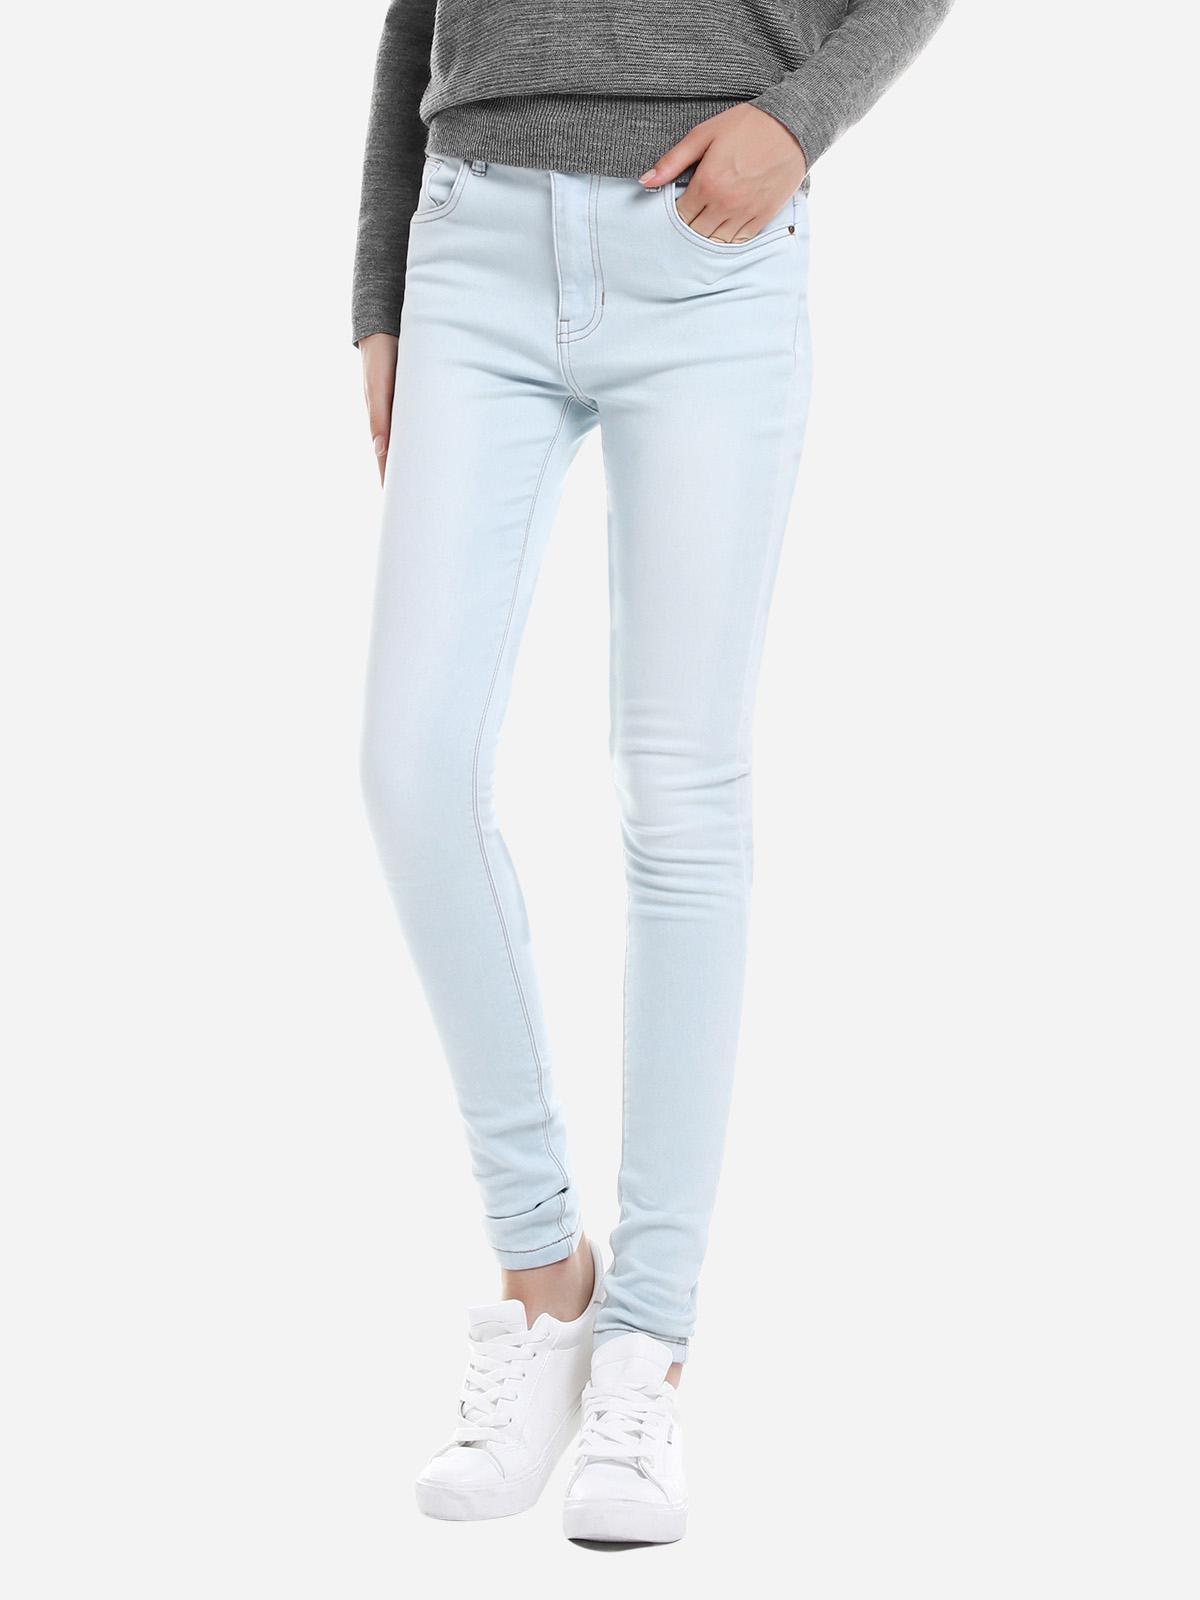 ZAN.STYLE Super Skinny Jeans